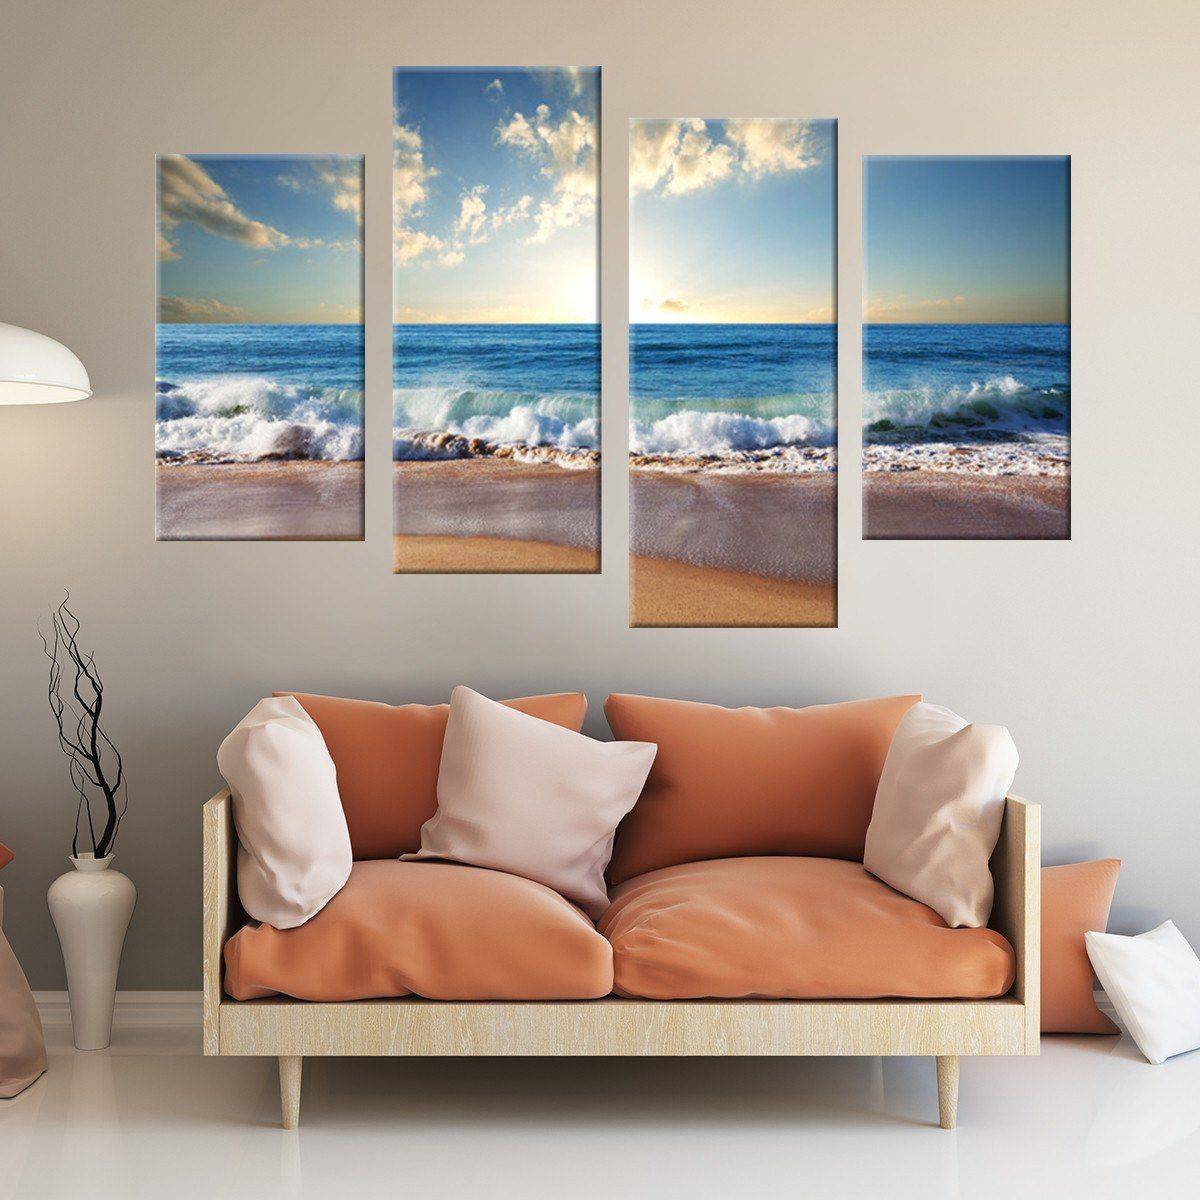 Crashing Waves 4 Piece Staggered Canvas Wall Art Canvas Wall Art Set Cheap Canvas Wall Art Canvas Wall Art